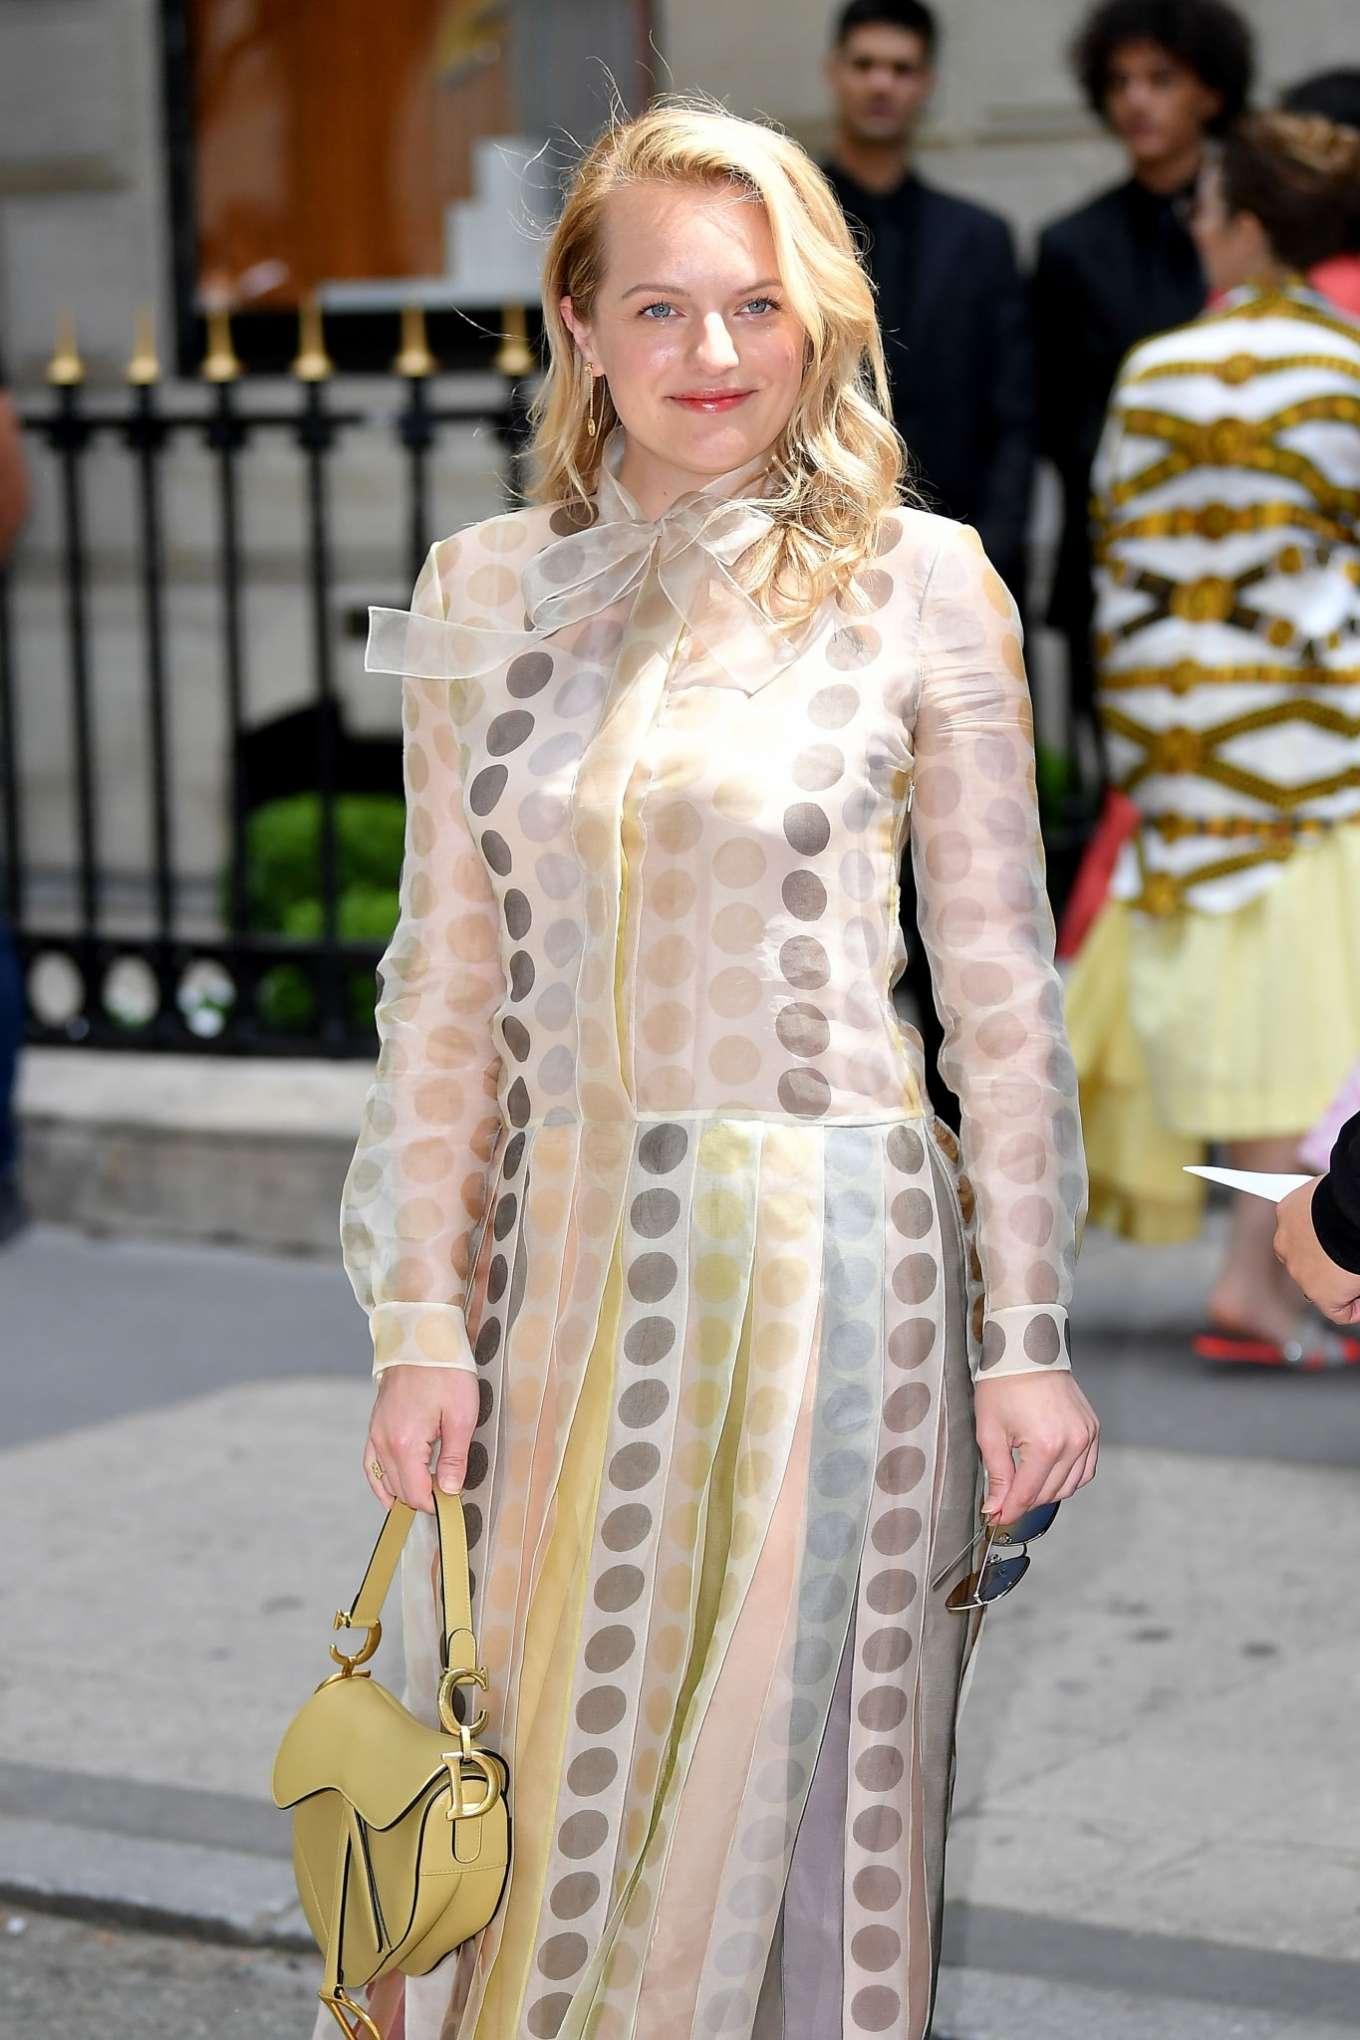 Elisabeth Moss - 2019 Paris Fashion Week - Christian Dior Haute Couture FW 2019/20